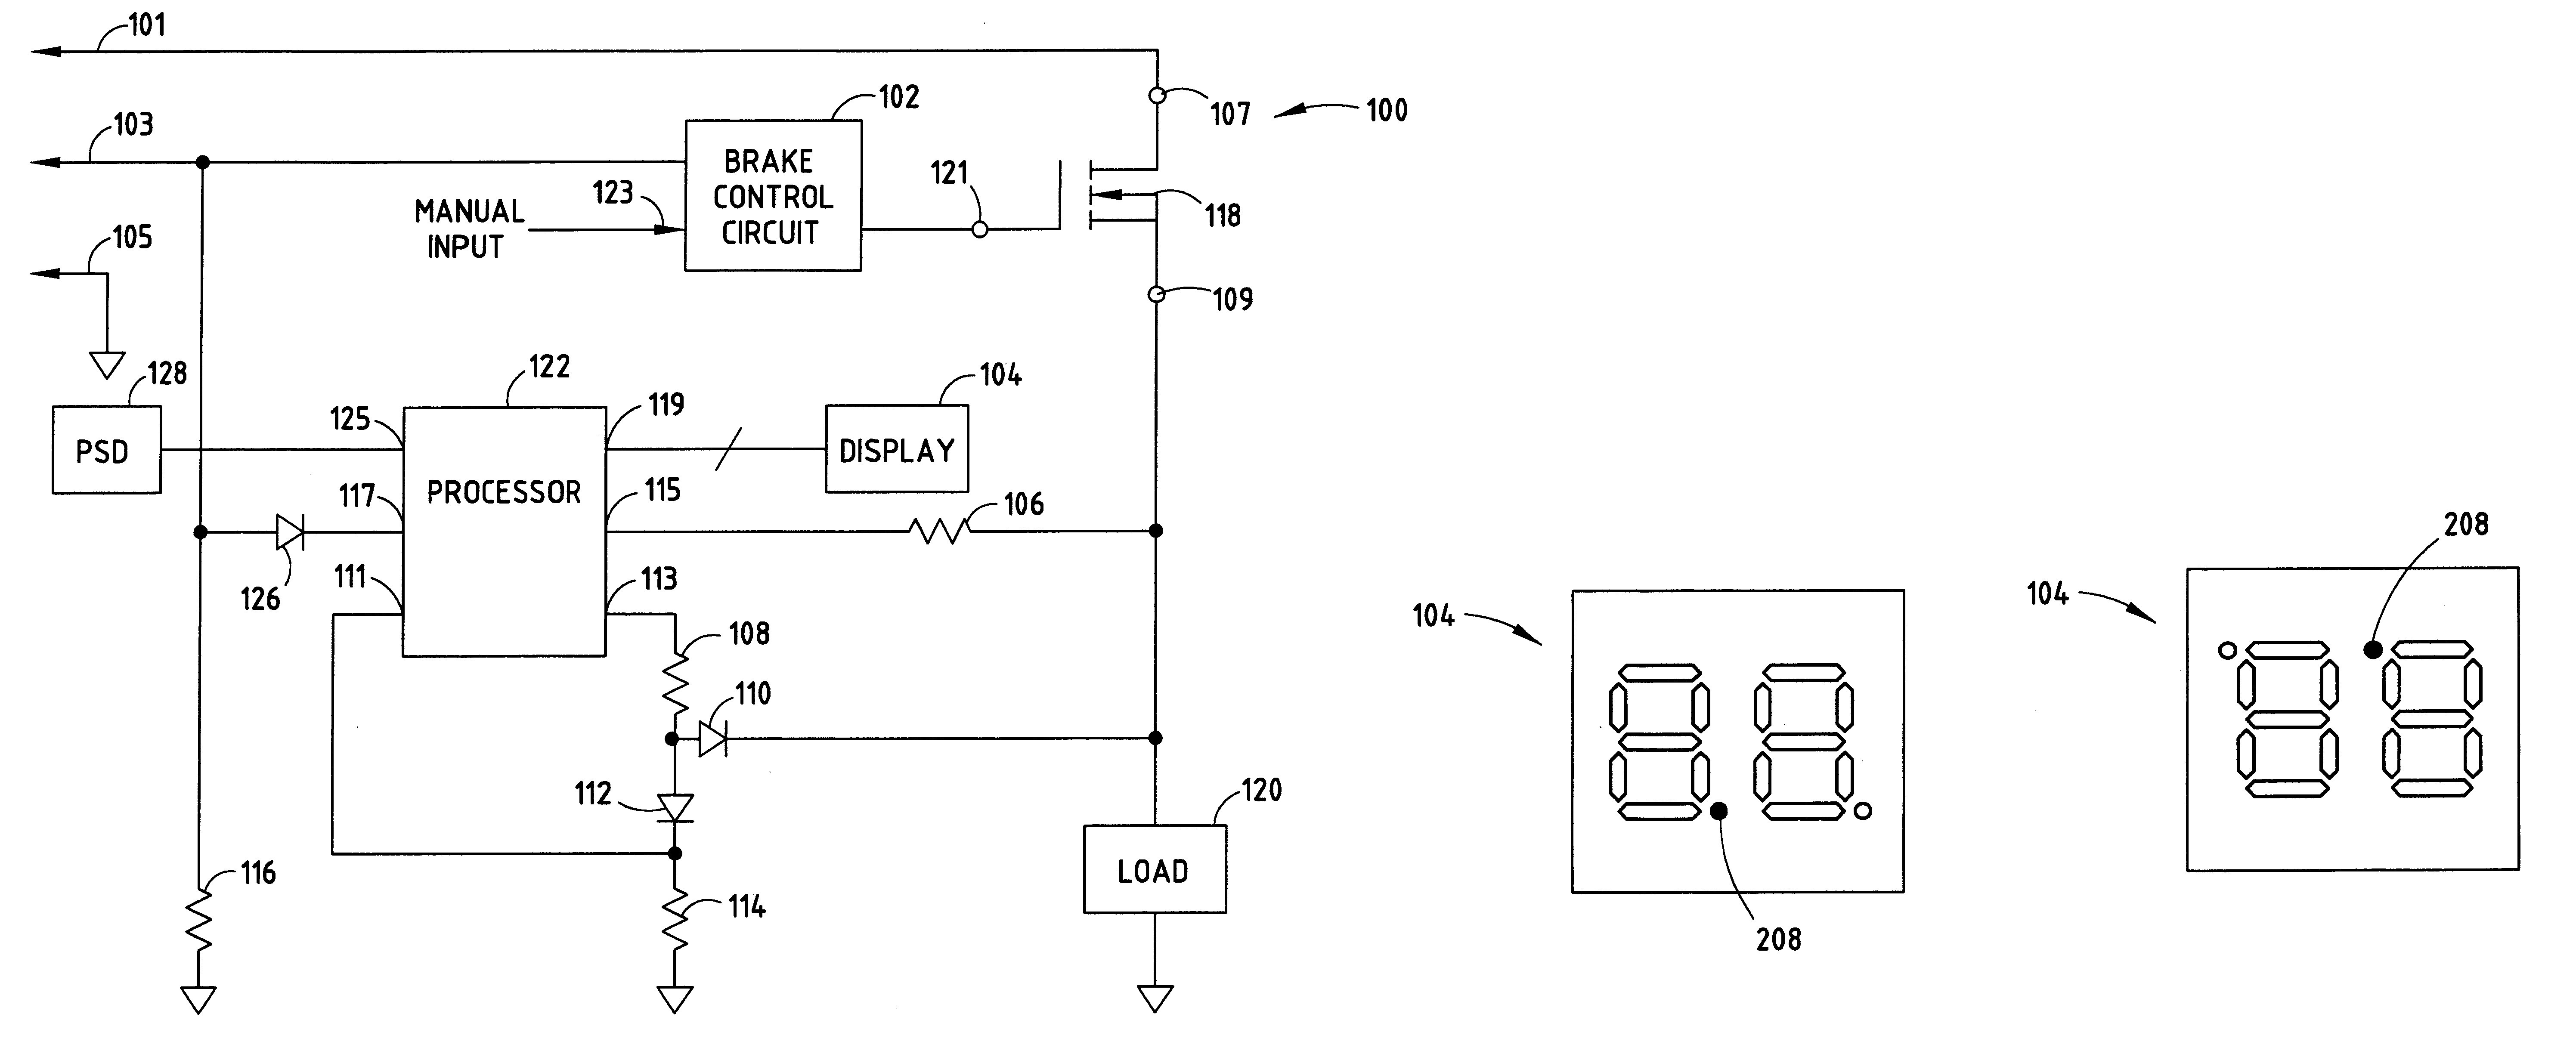 tekonsha prodigy p2 wiring diagram tekonsha voyager electric ke wiring diagram wiring diagram data  tekonsha voyager electric ke wiring